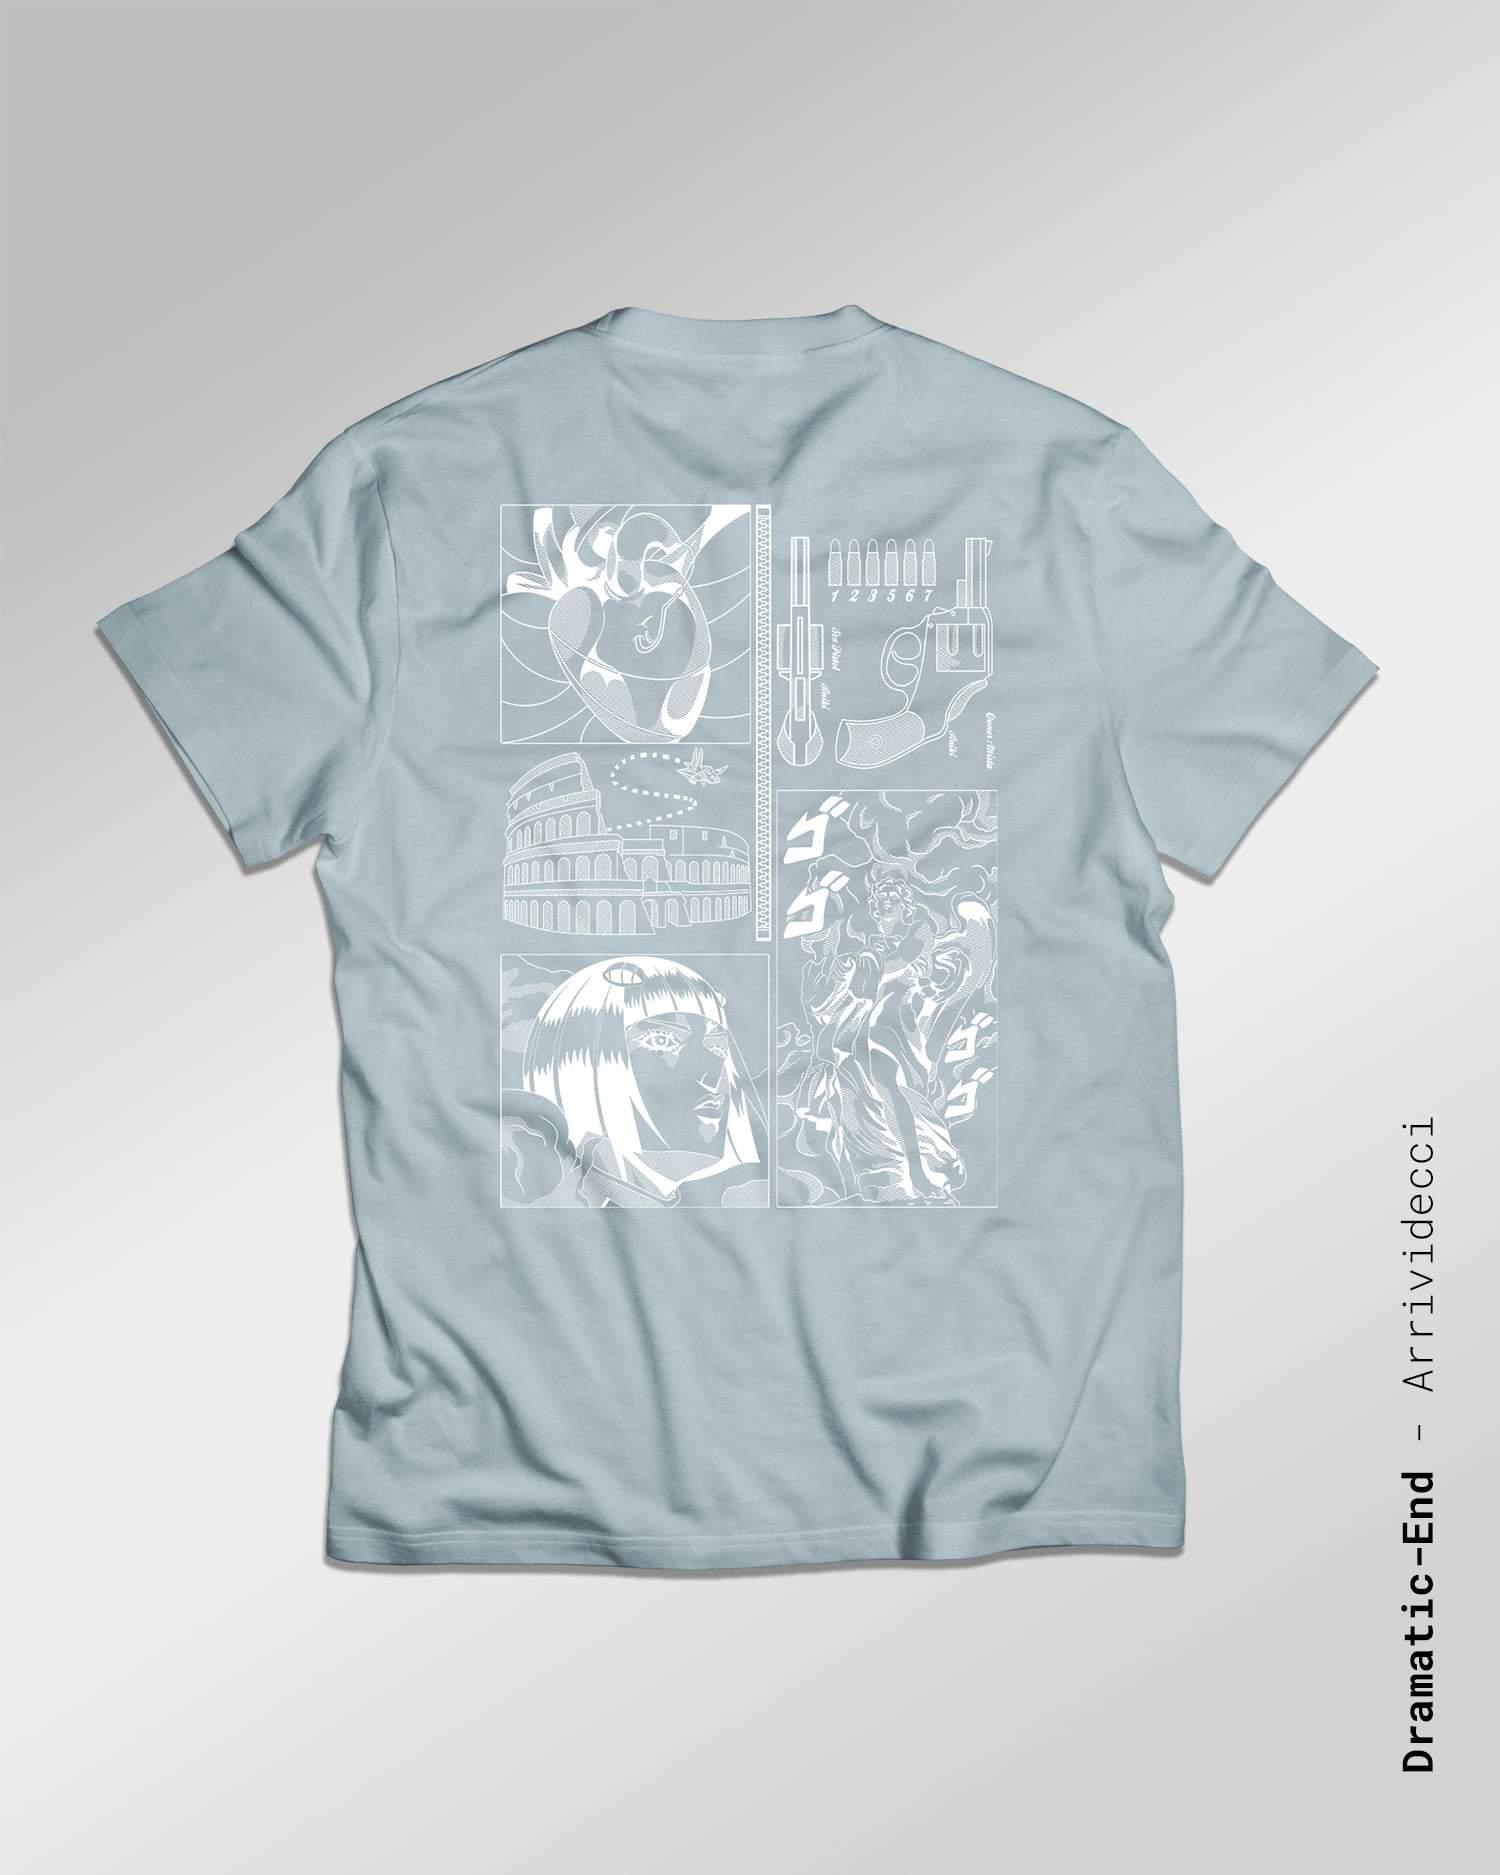 T-shirtmade in France l'univers de Jojo's bizarre Adventure